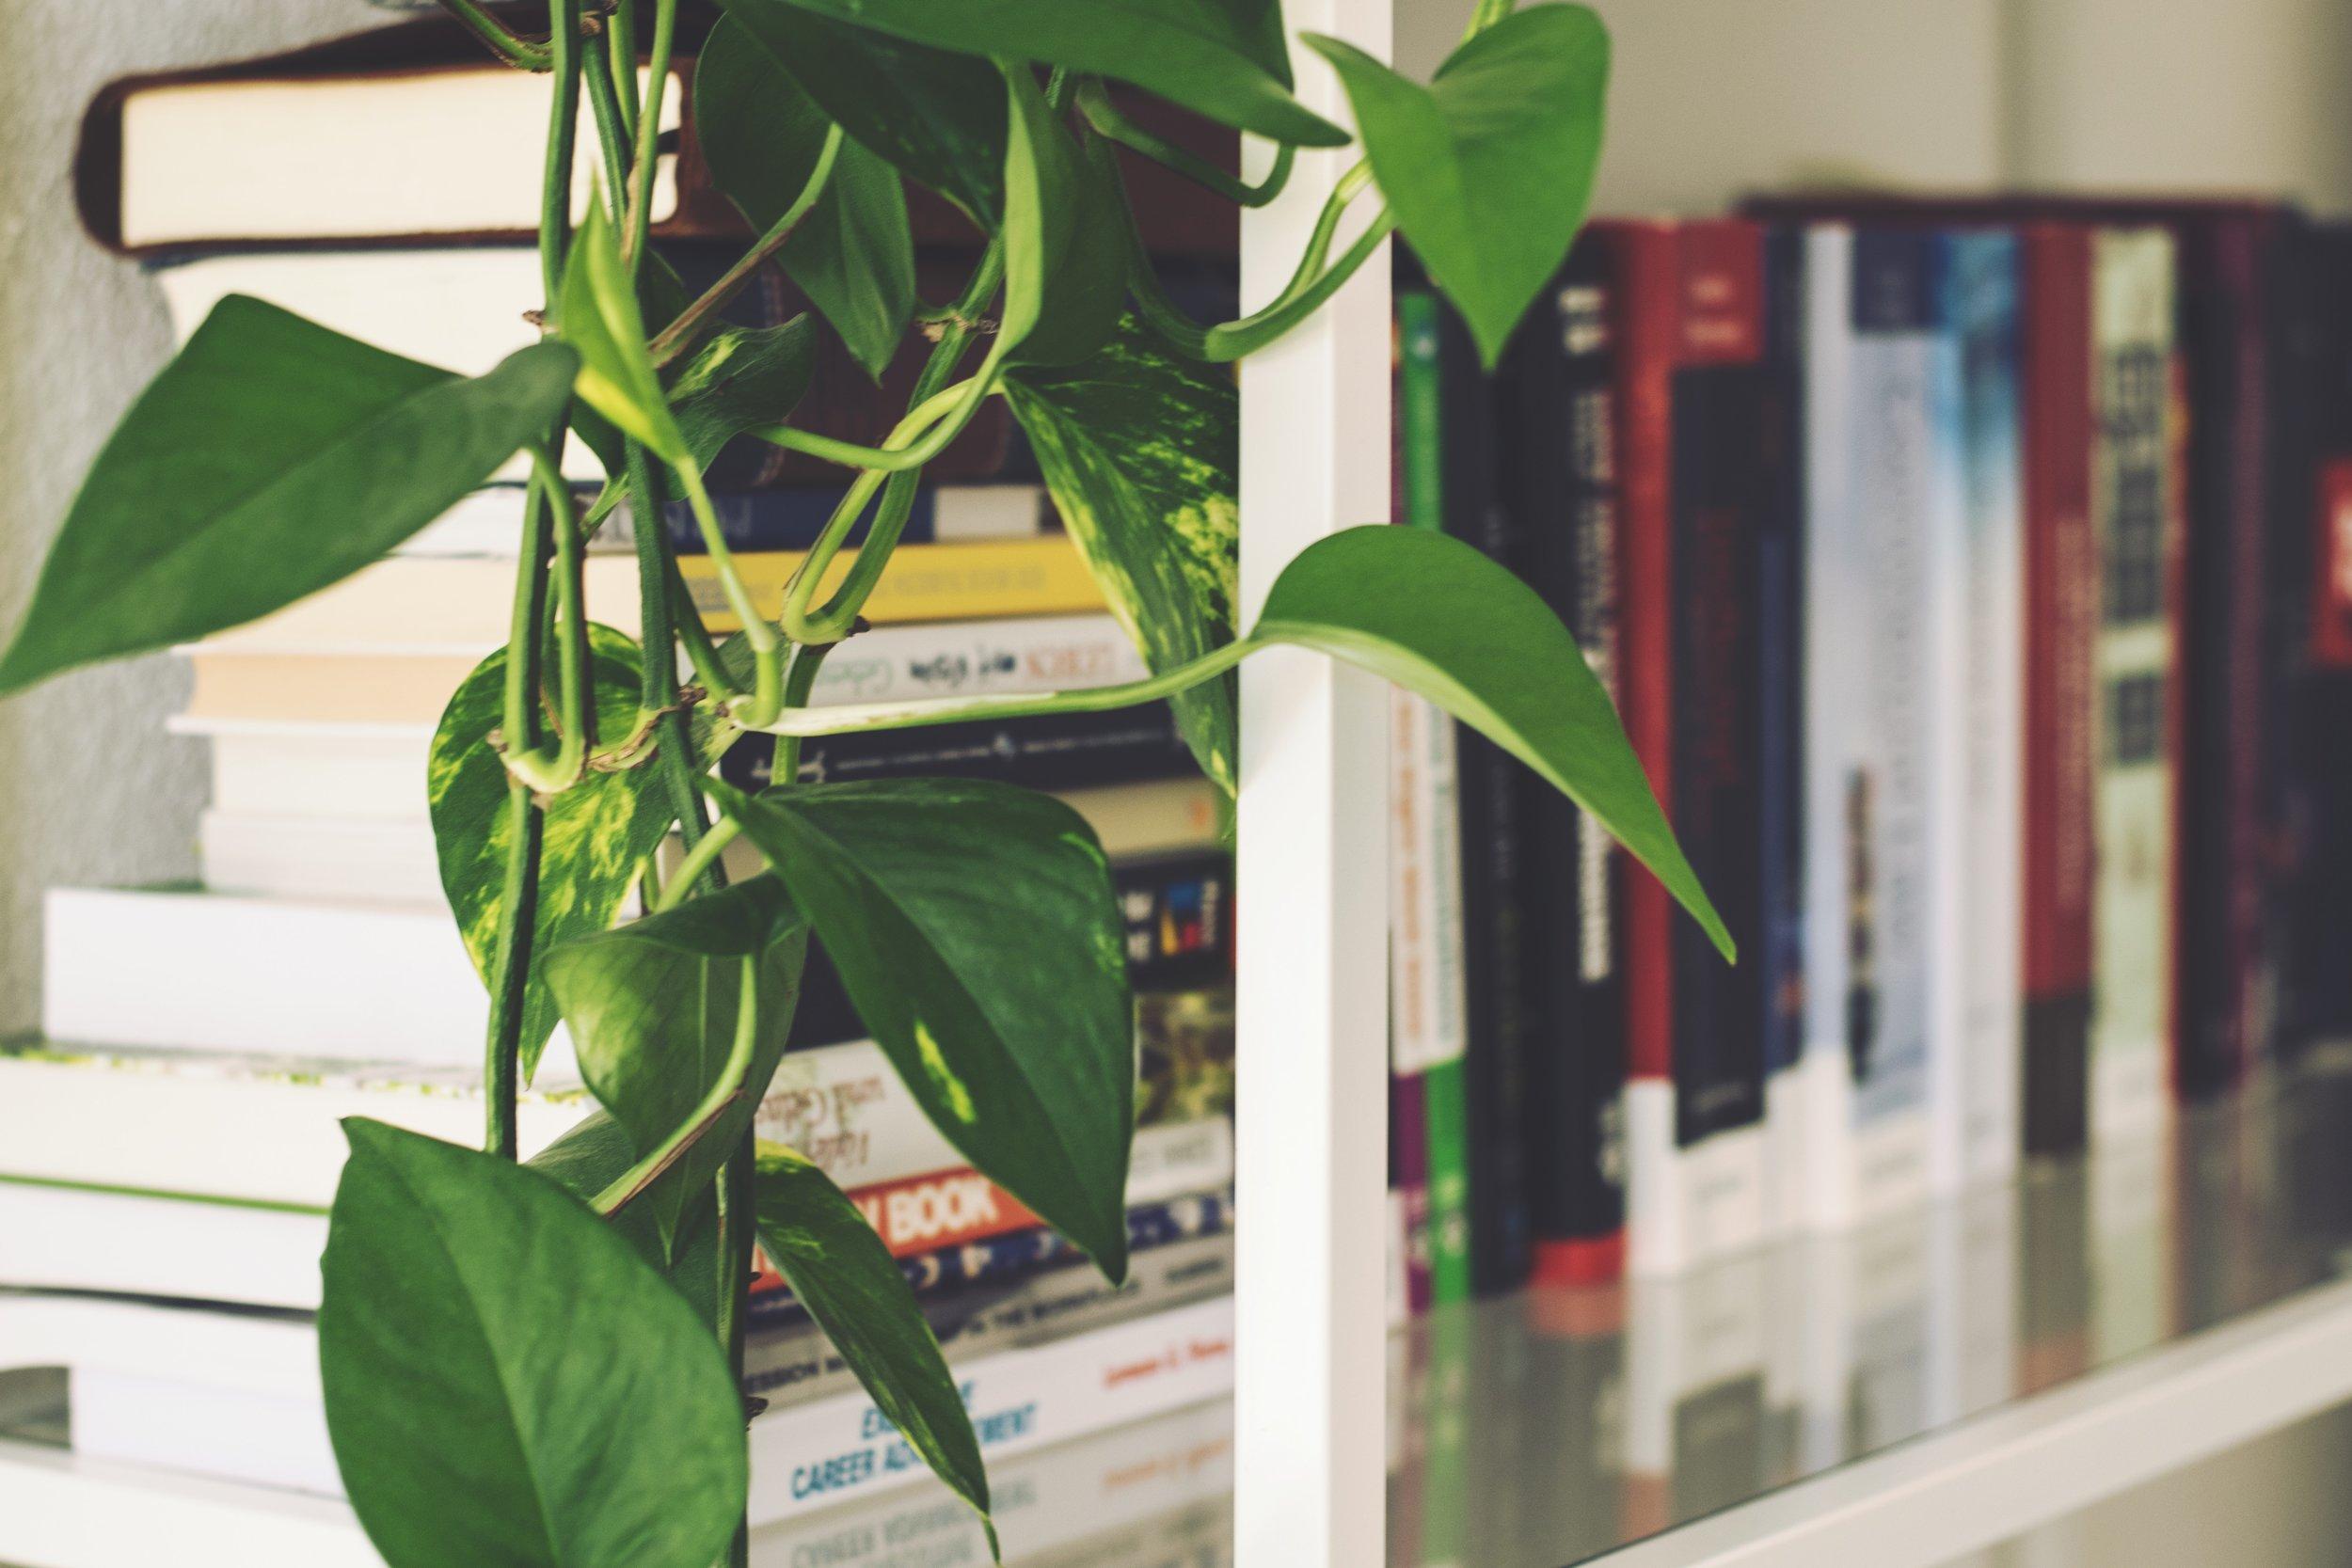 blur-bookcase-books-298660.jpg